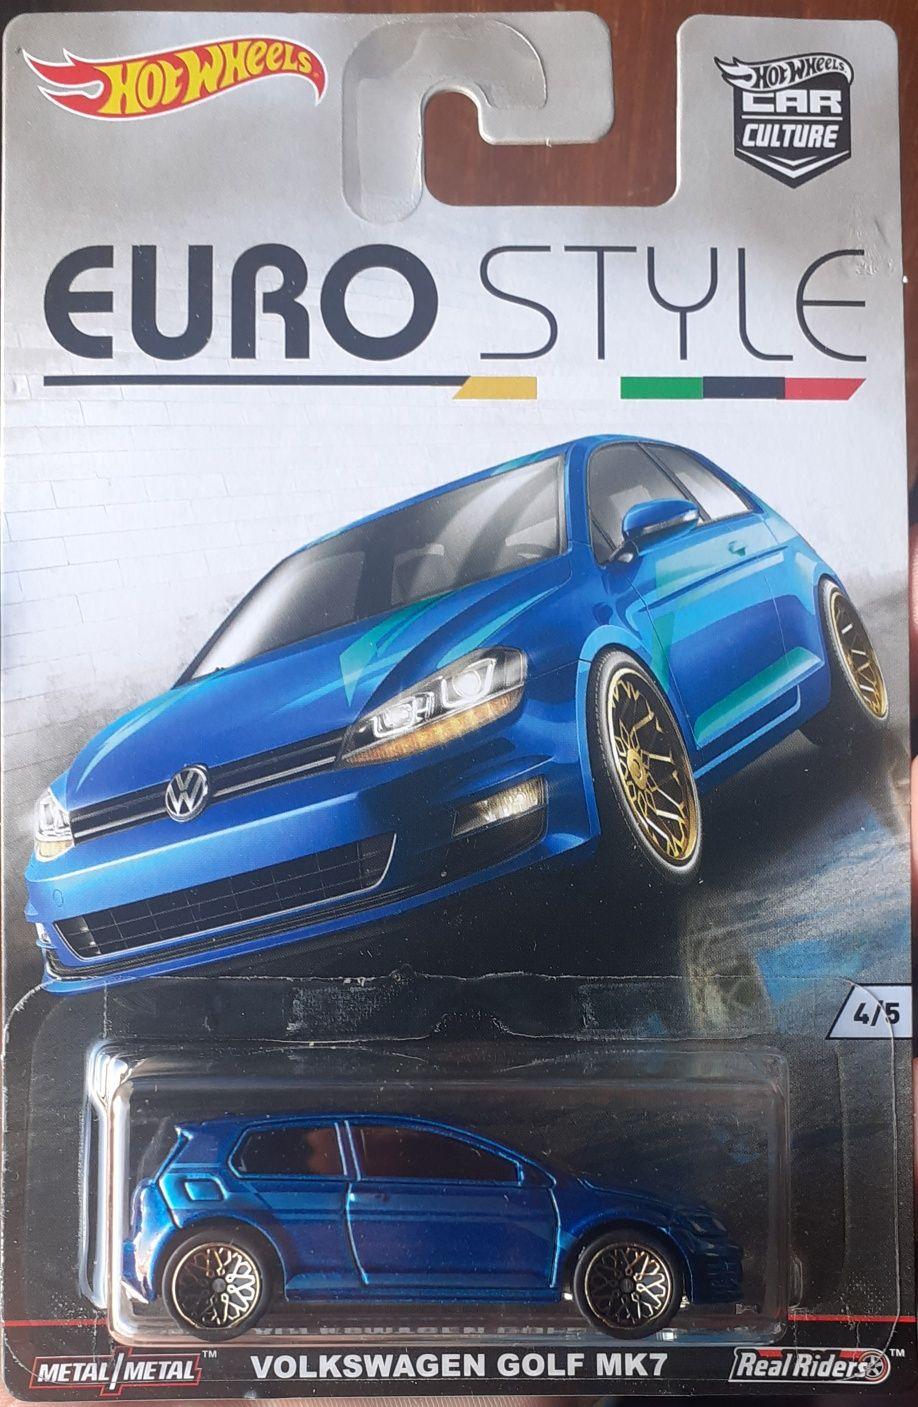 Volkswagen Golf mk7 (rodas de borracha)